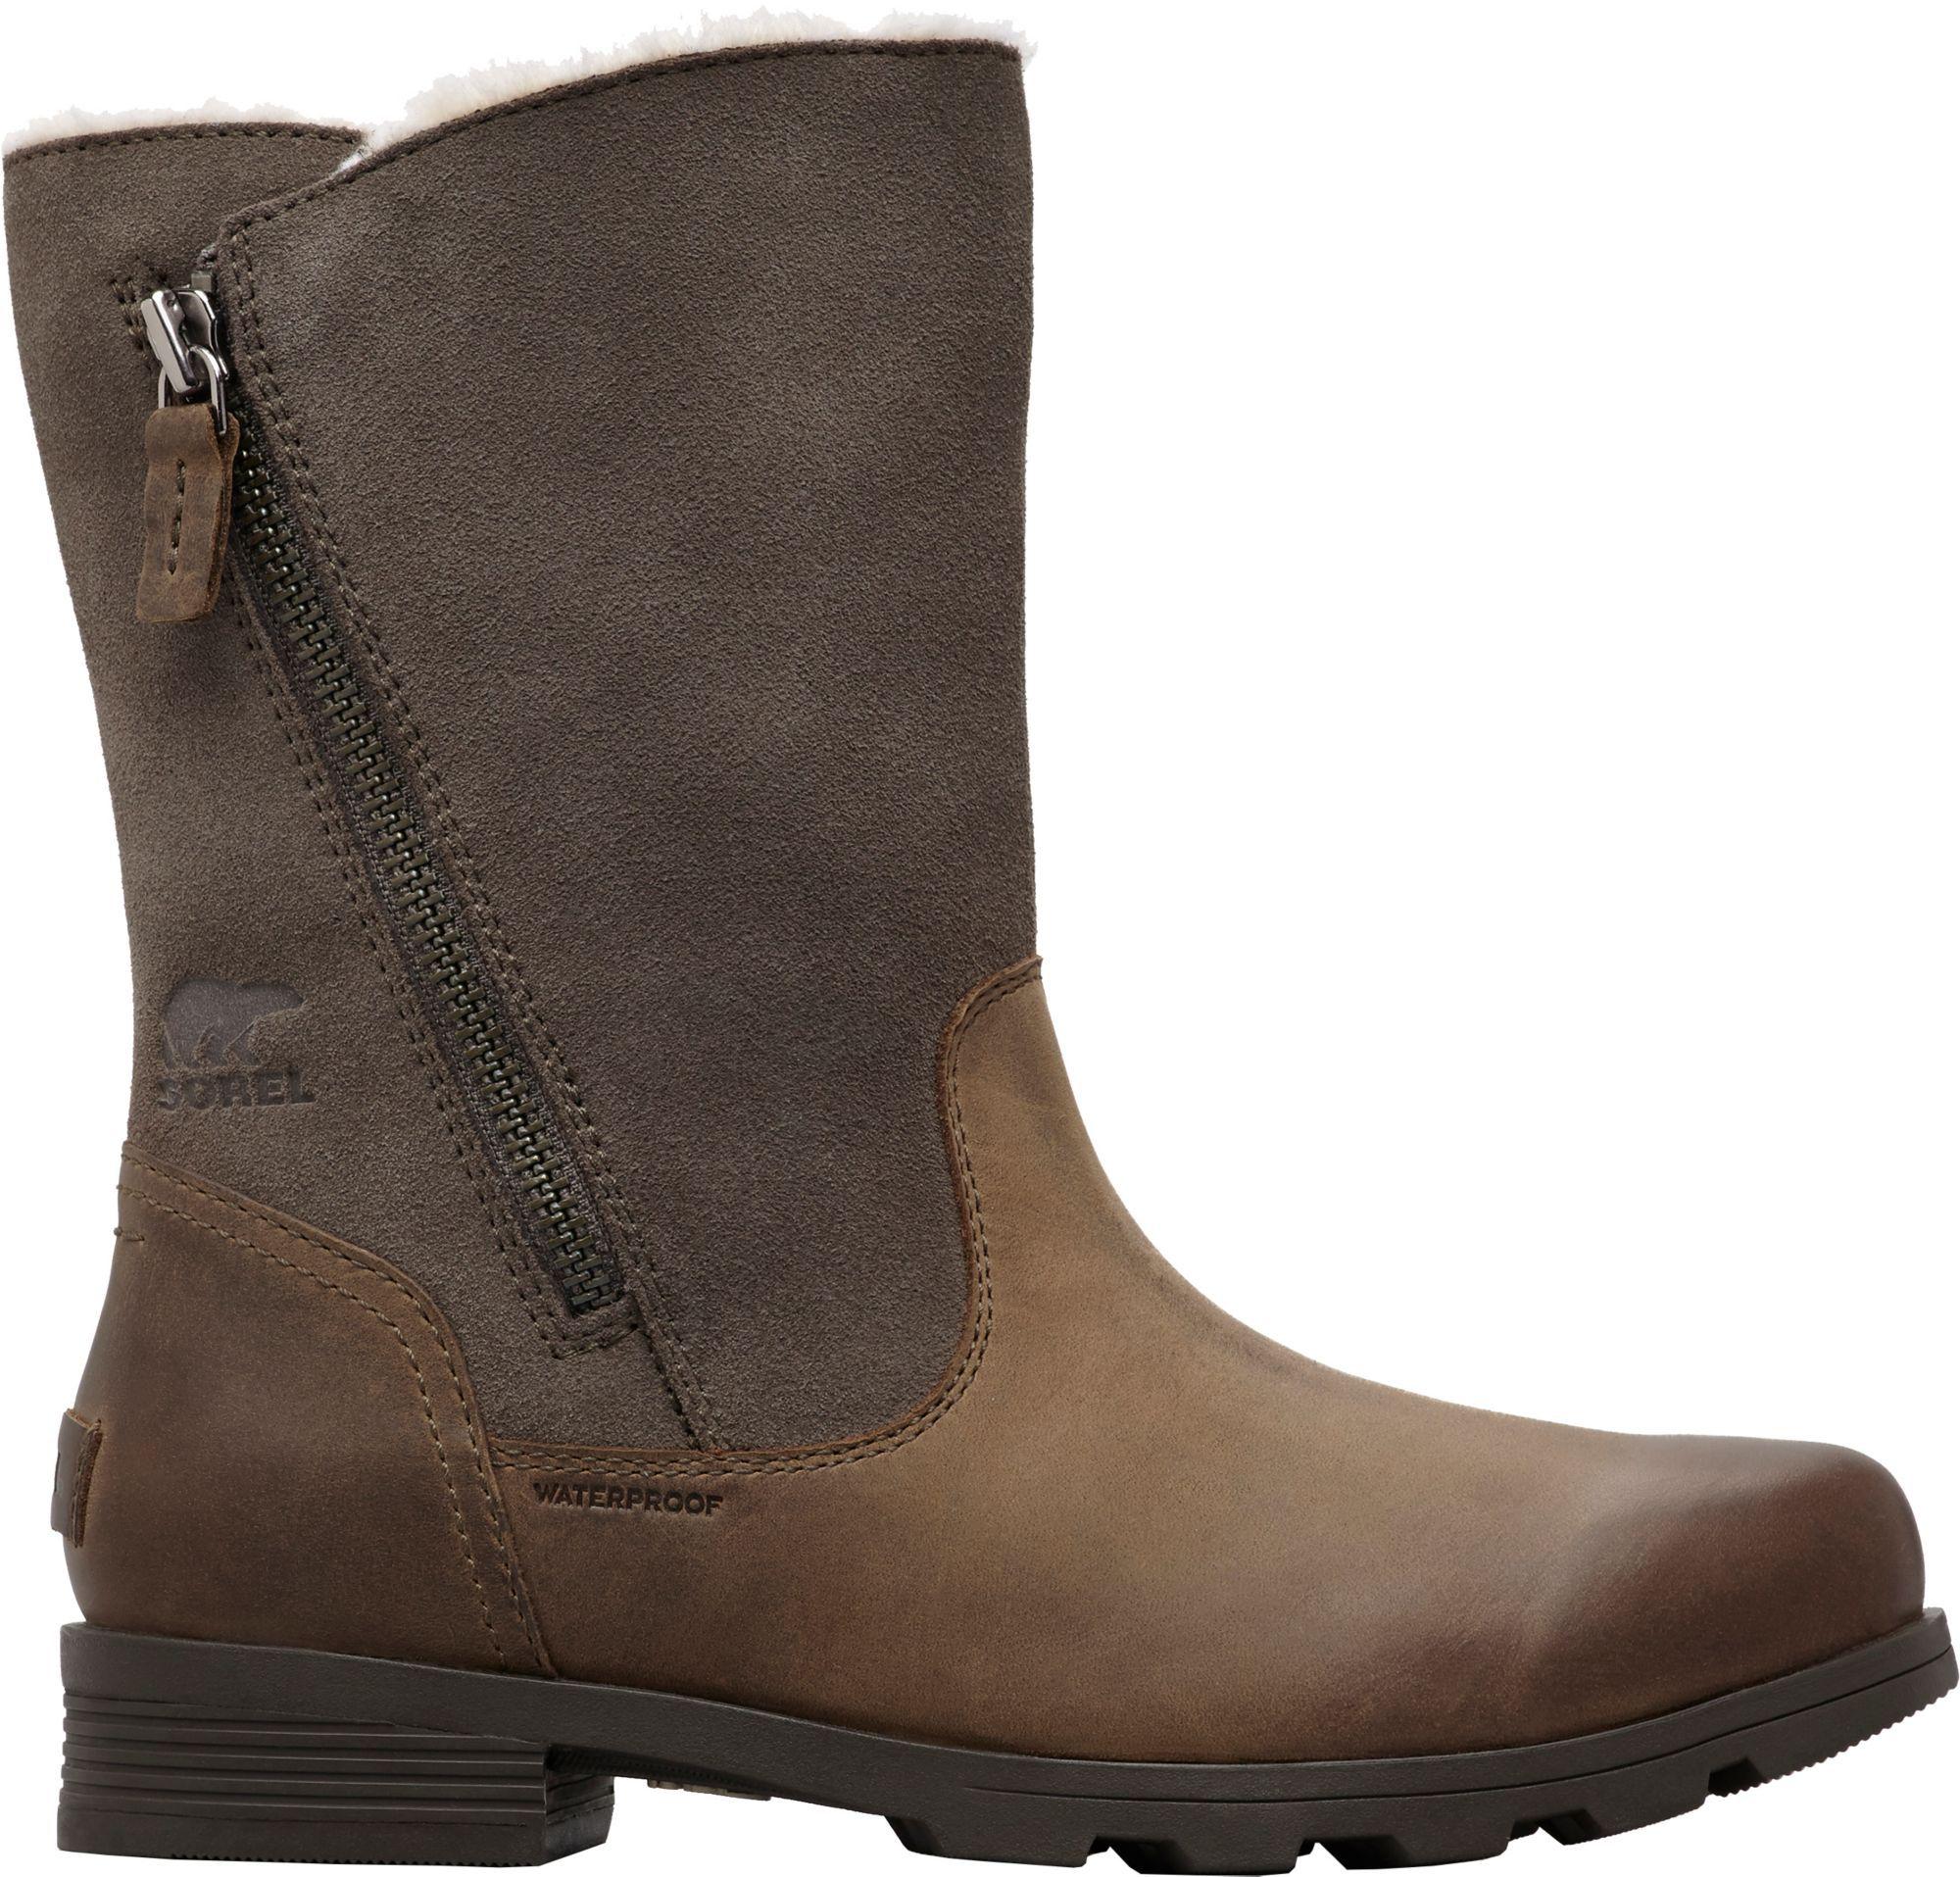 495196fe4c6aa8 SOREL Women s Emelie Fold-Over Waterproof 100g Winter Boots ...